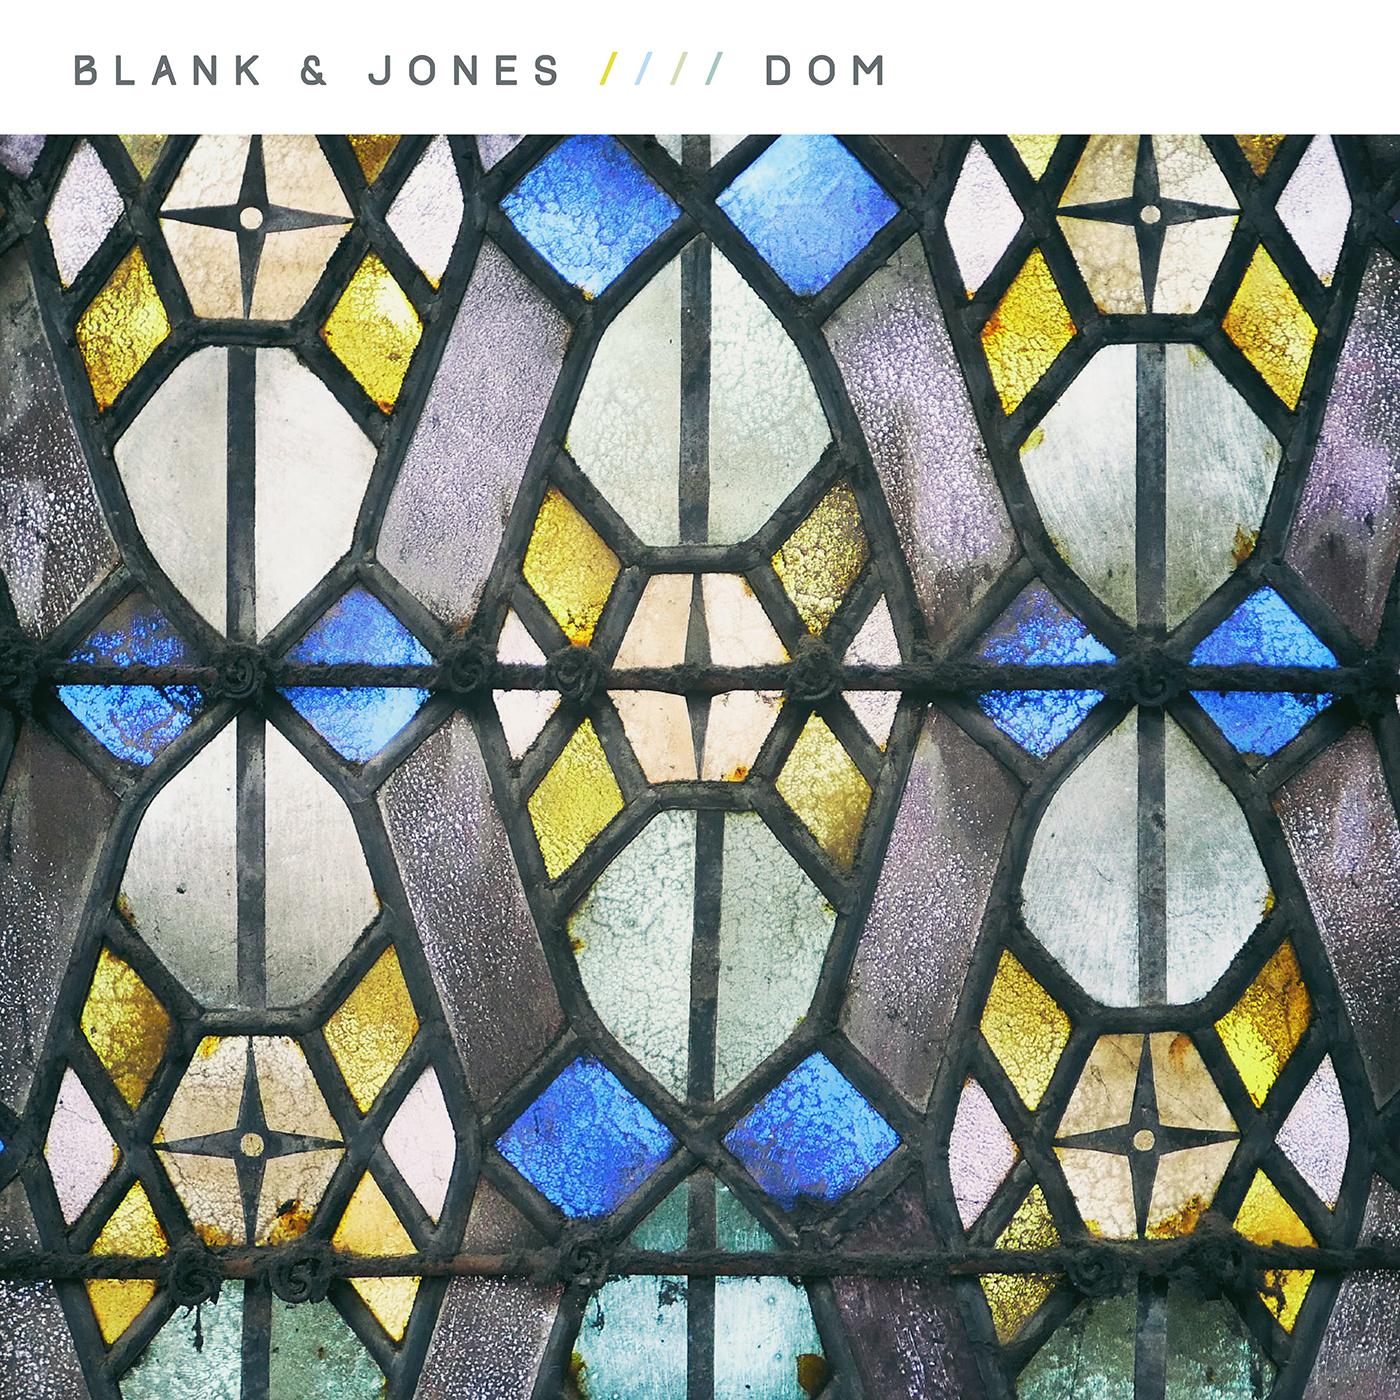 Blank & Jones entern den Kölner Dom